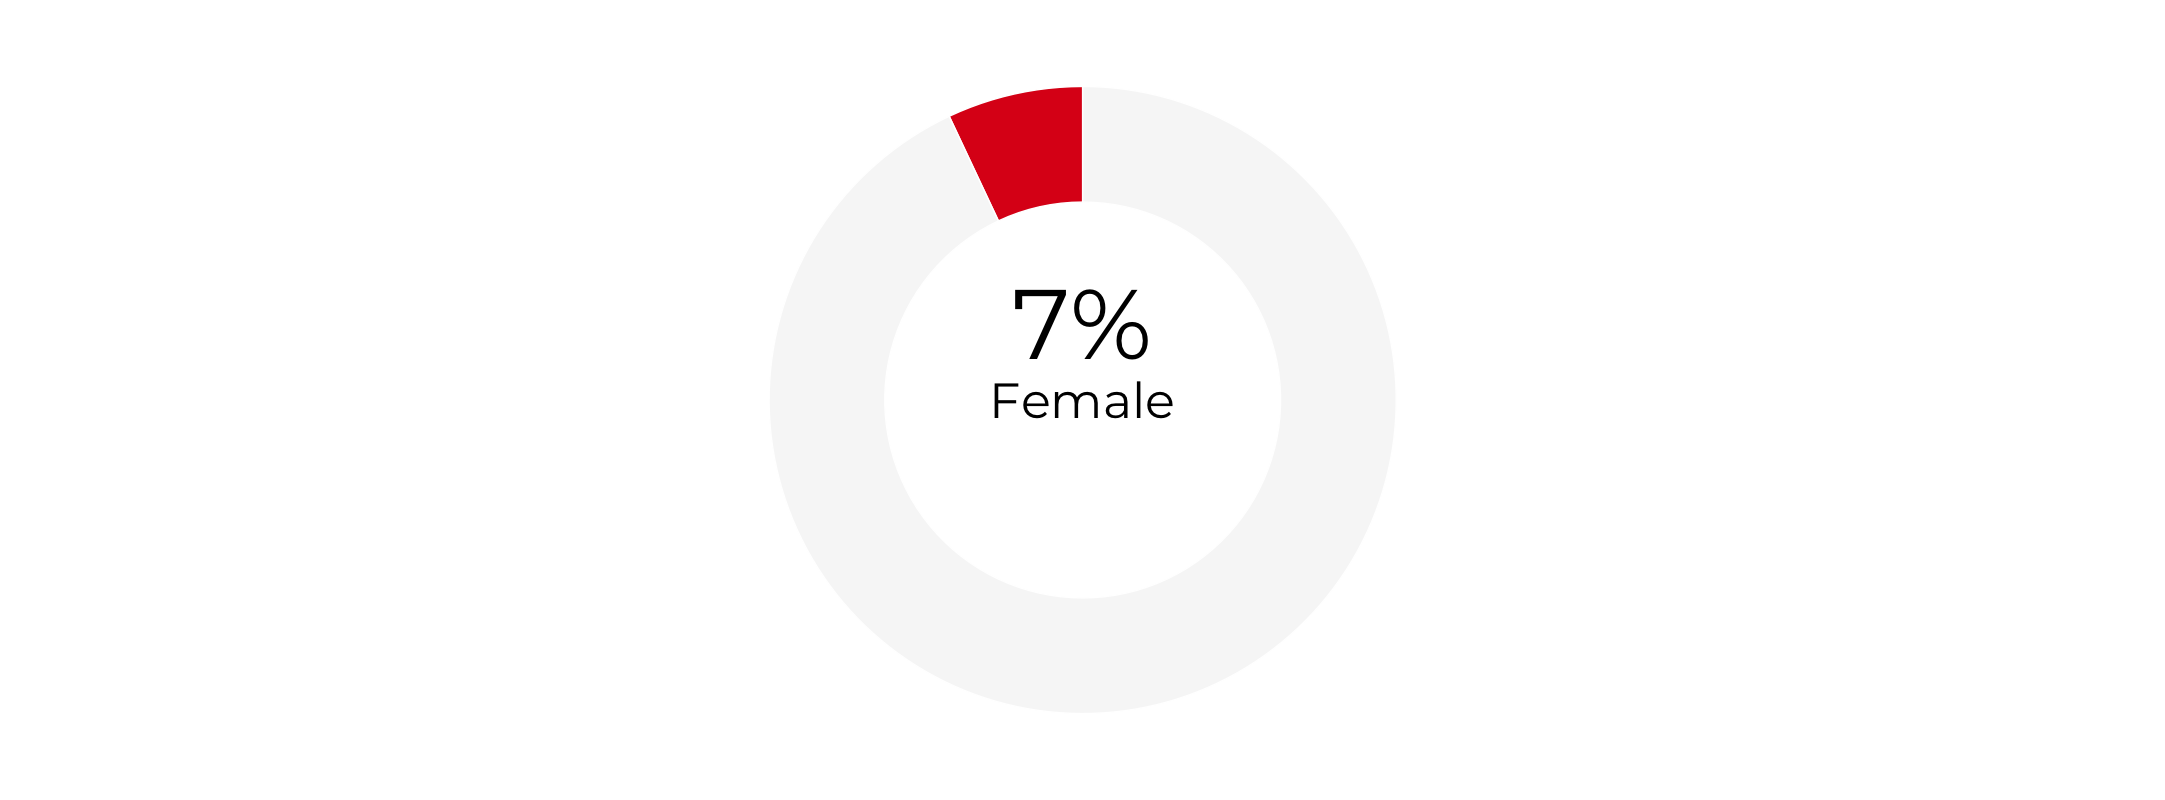 Graph about Gender Composition of Secretaries of Energy. More detailed text description below.